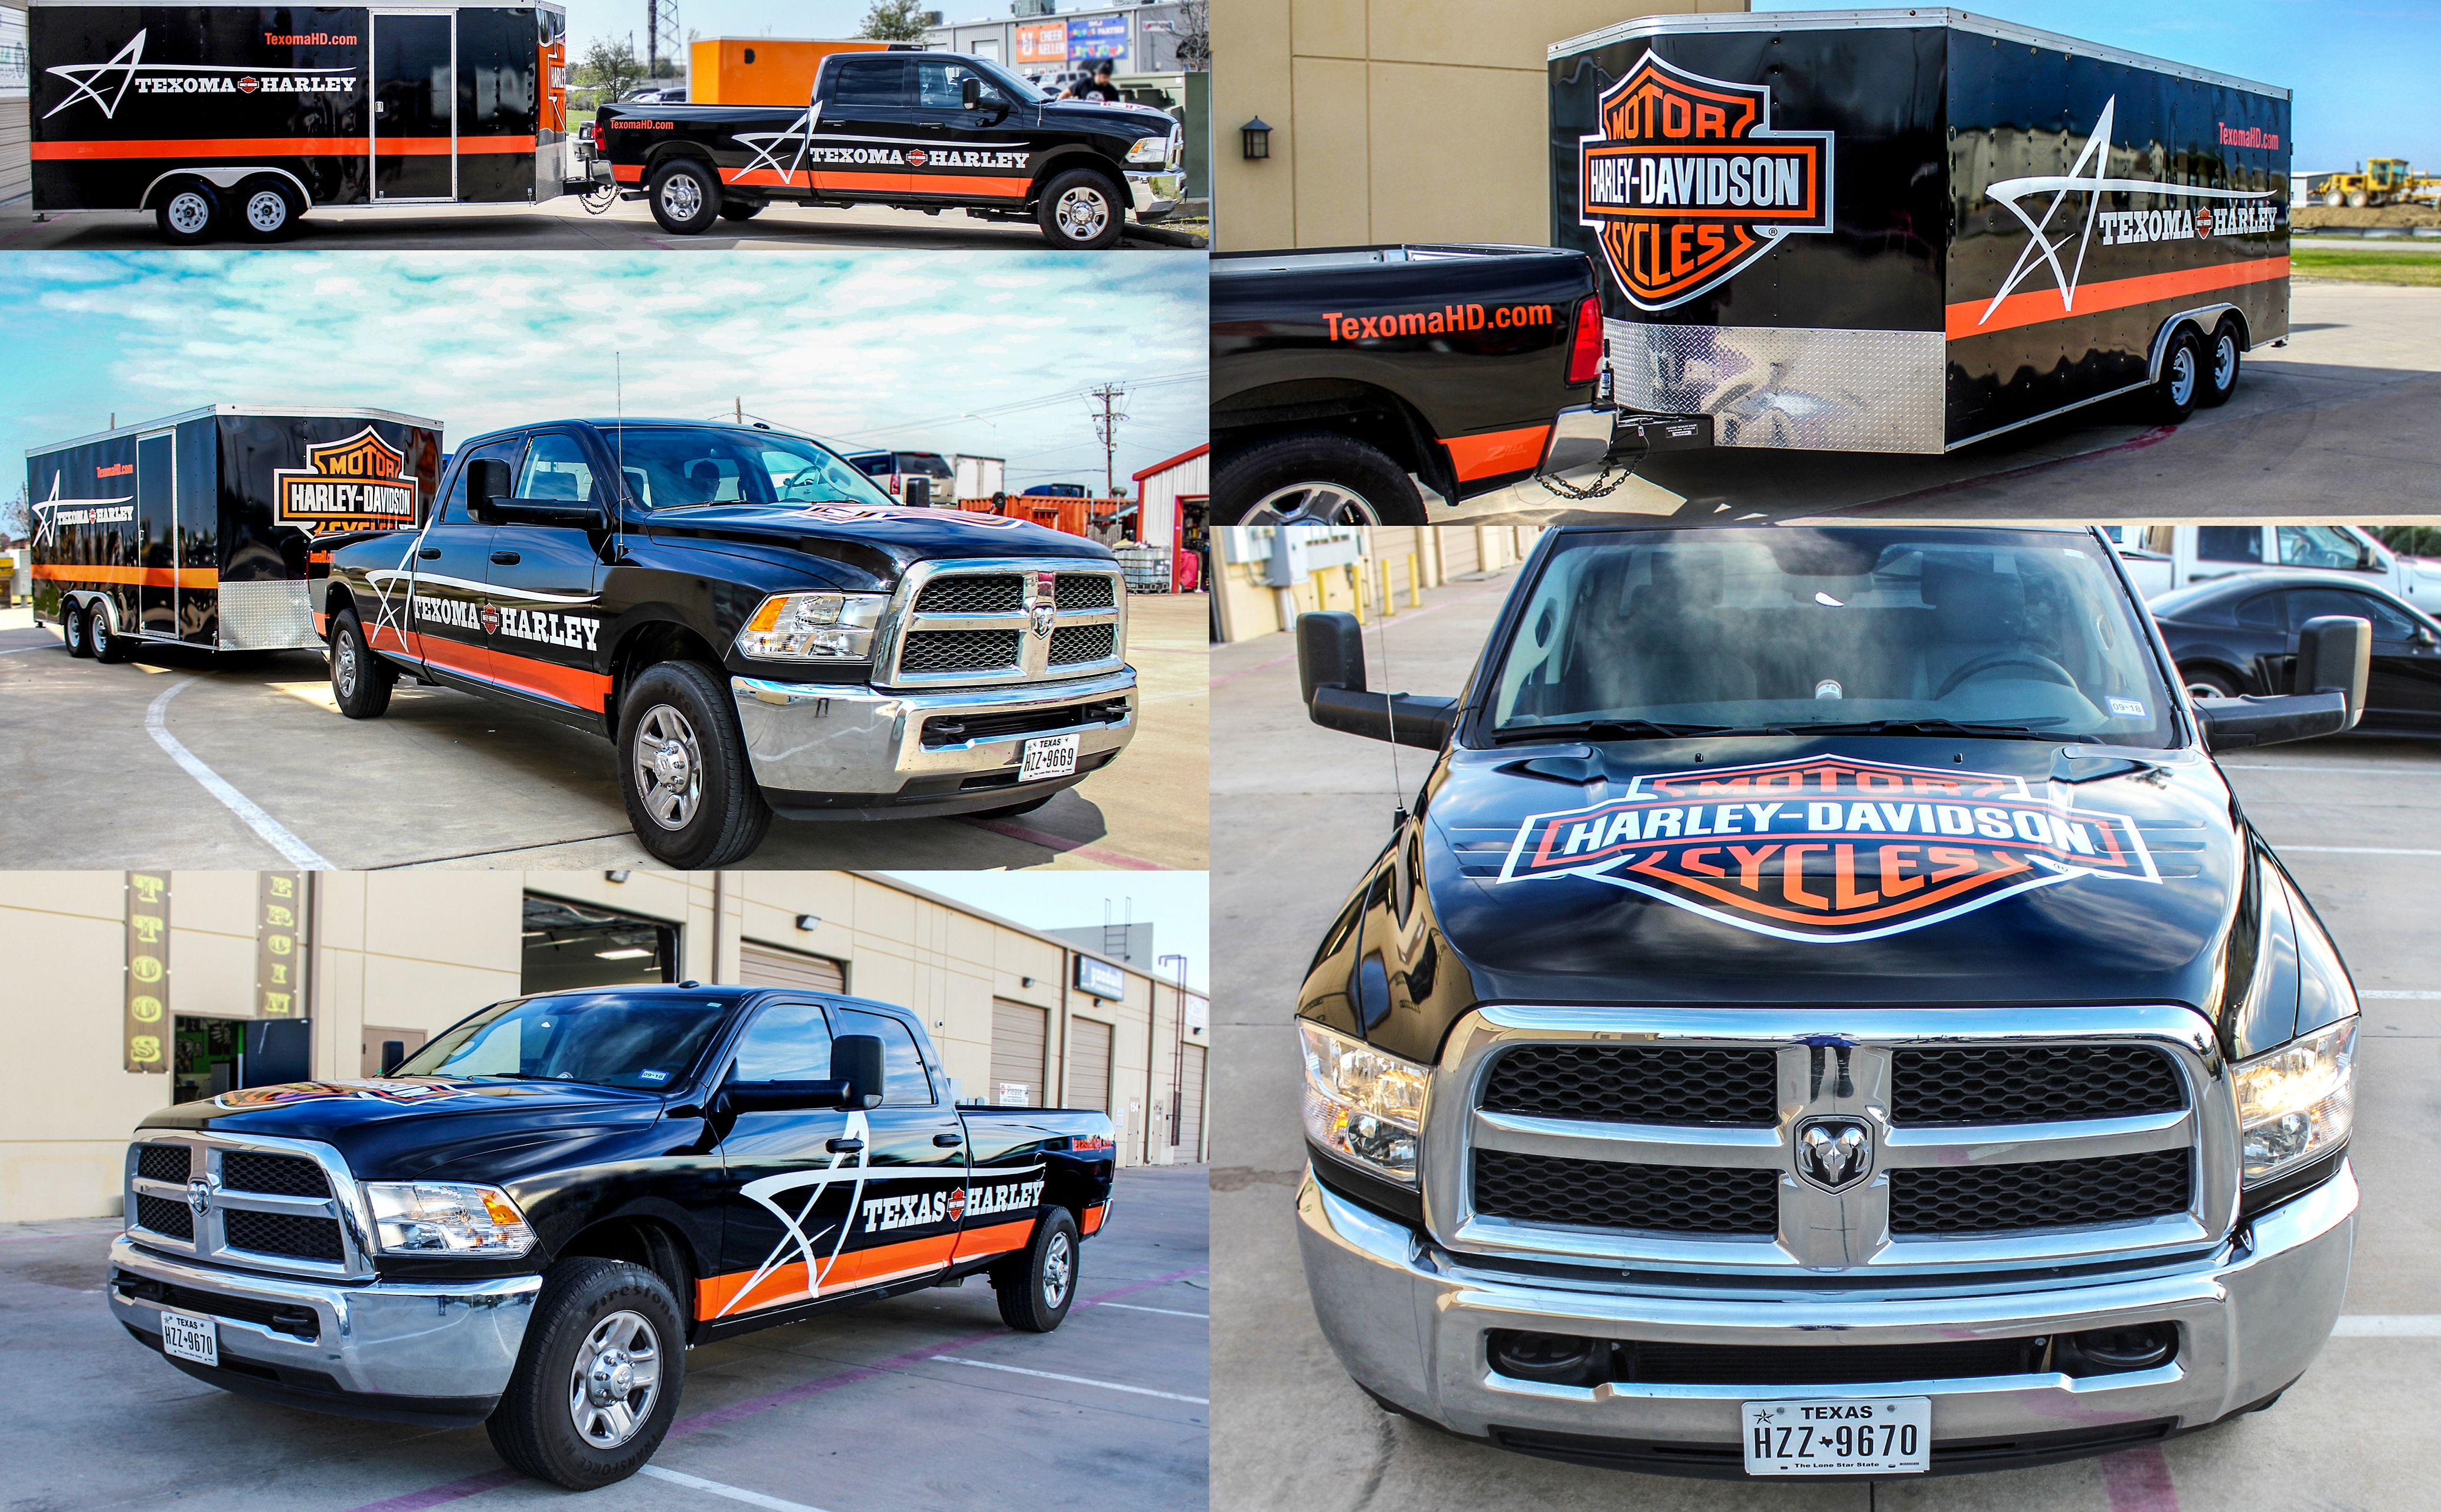 Harley davidson truck and trailer wrap custom texas harley wrap transport trailer wrap graphics